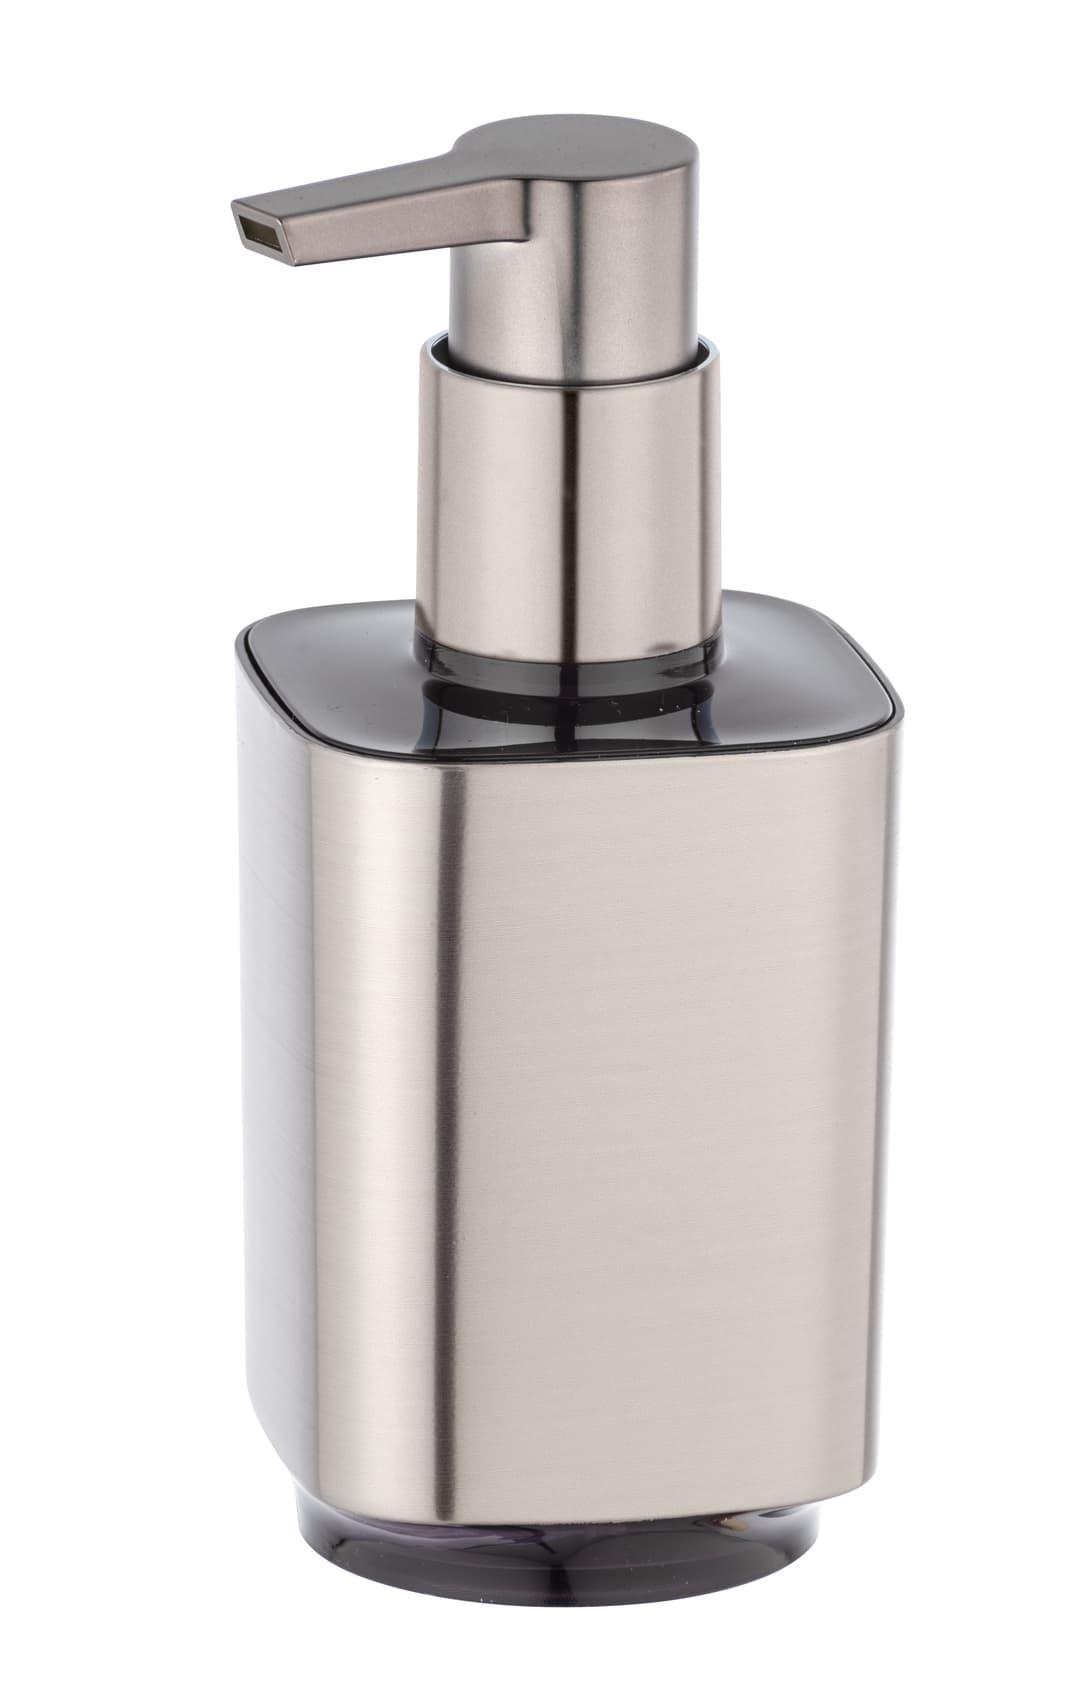 Dozator pentru sapun, din plastic, Auron Crom, L7xl8xH16,5 cm imagine